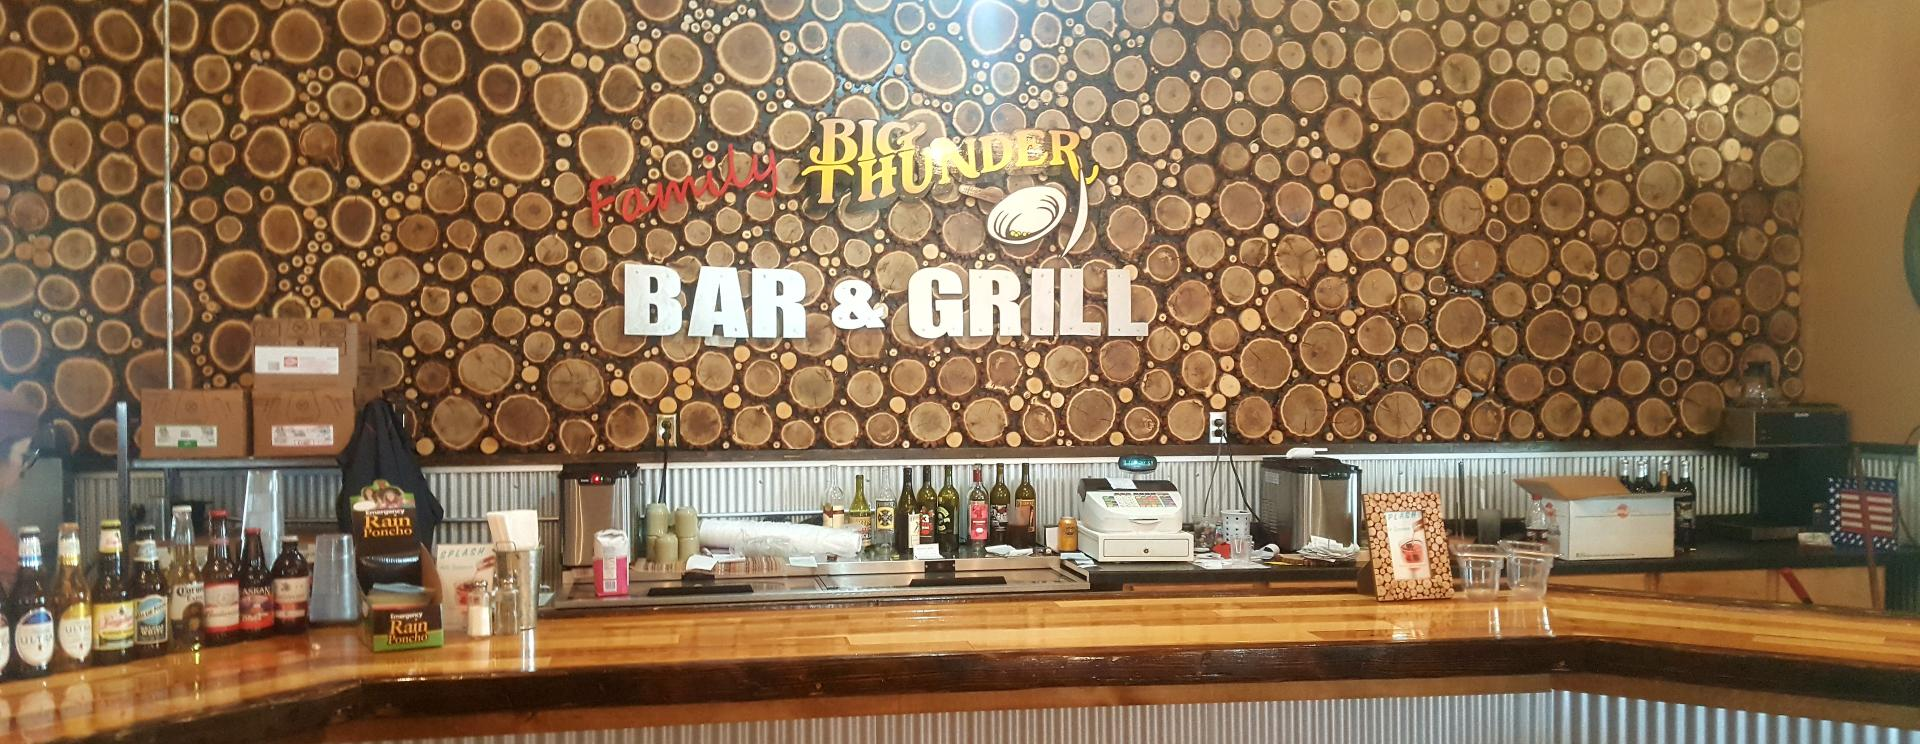 Big Thunder Family Bar & Grill